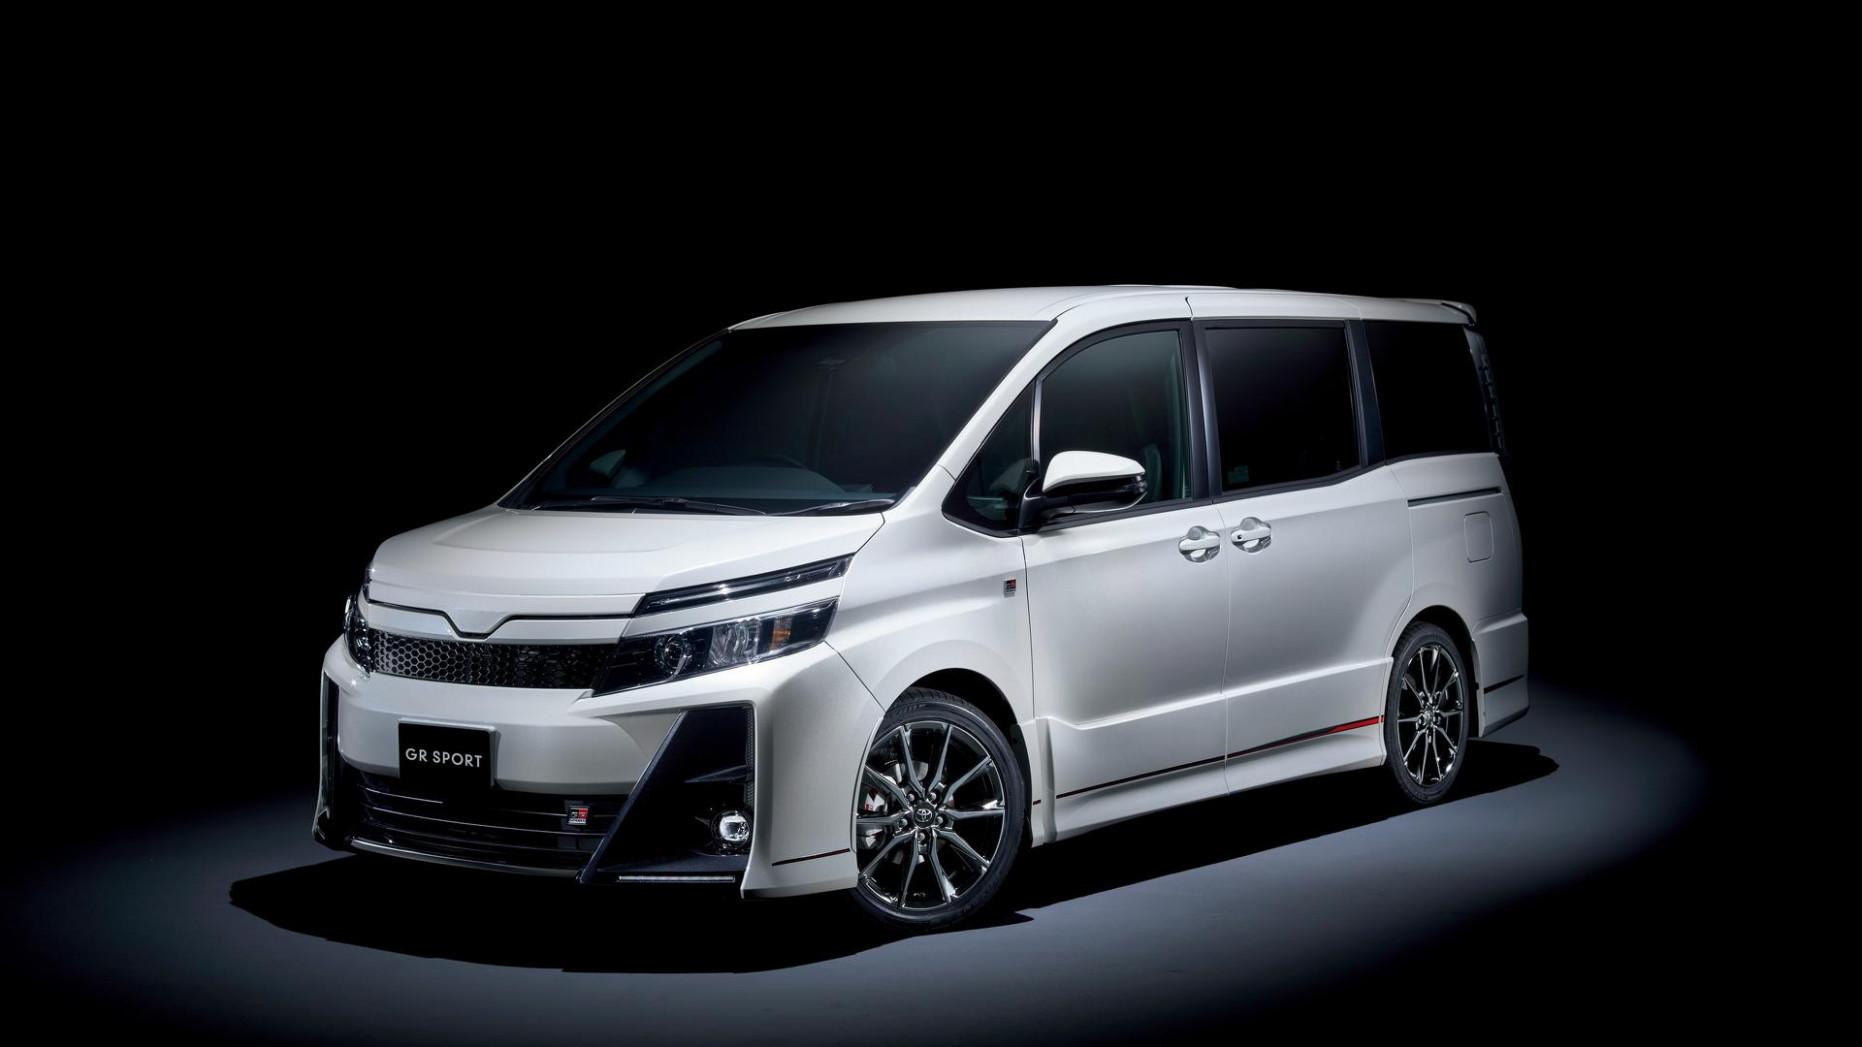 Pricing Toyota Voxy 2022